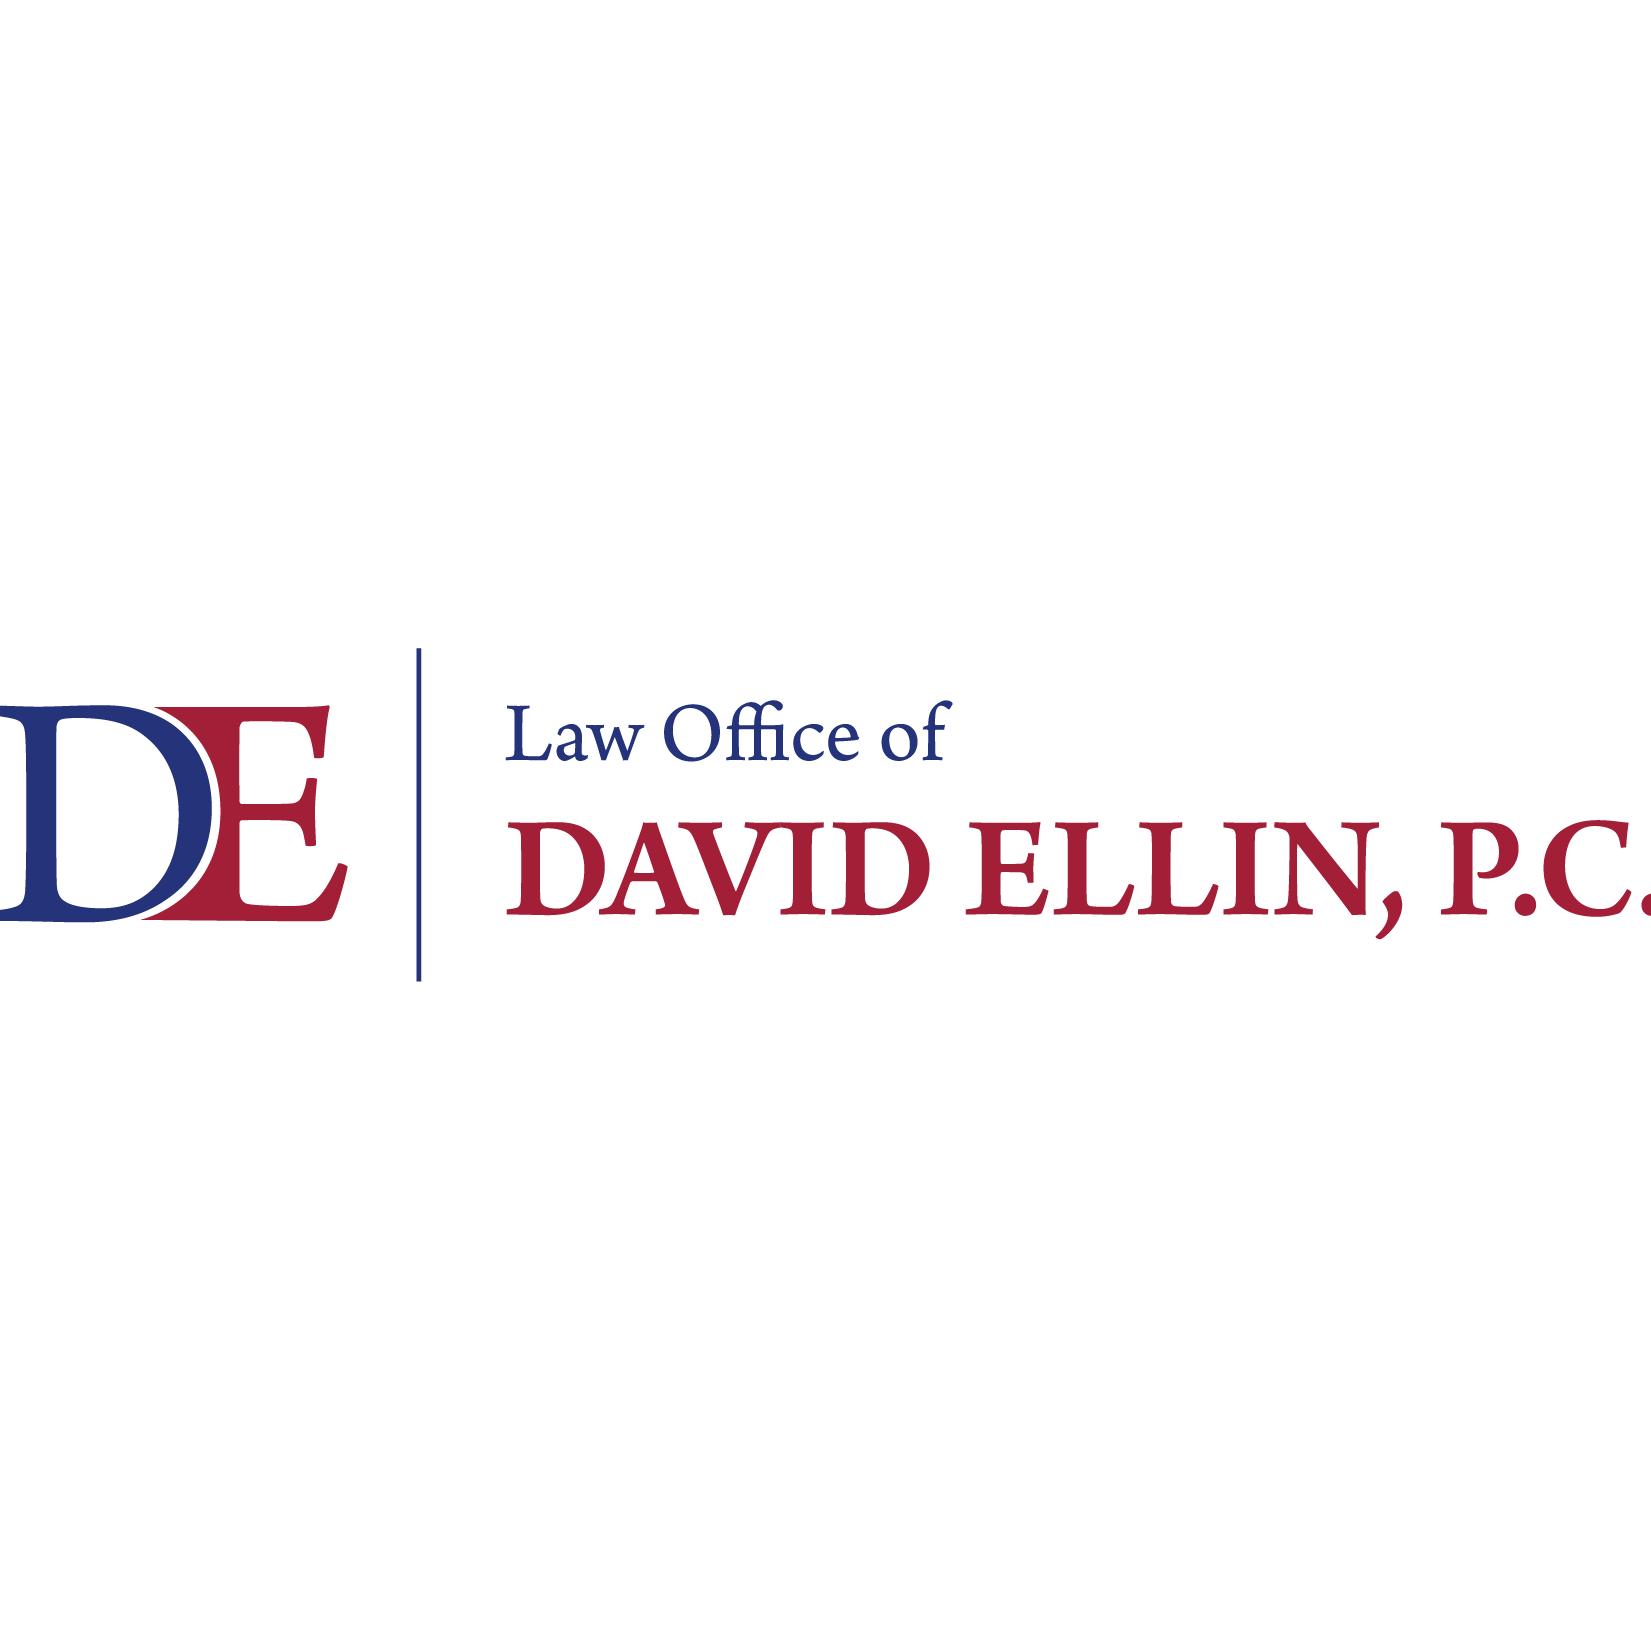 Law Office of David Ellin